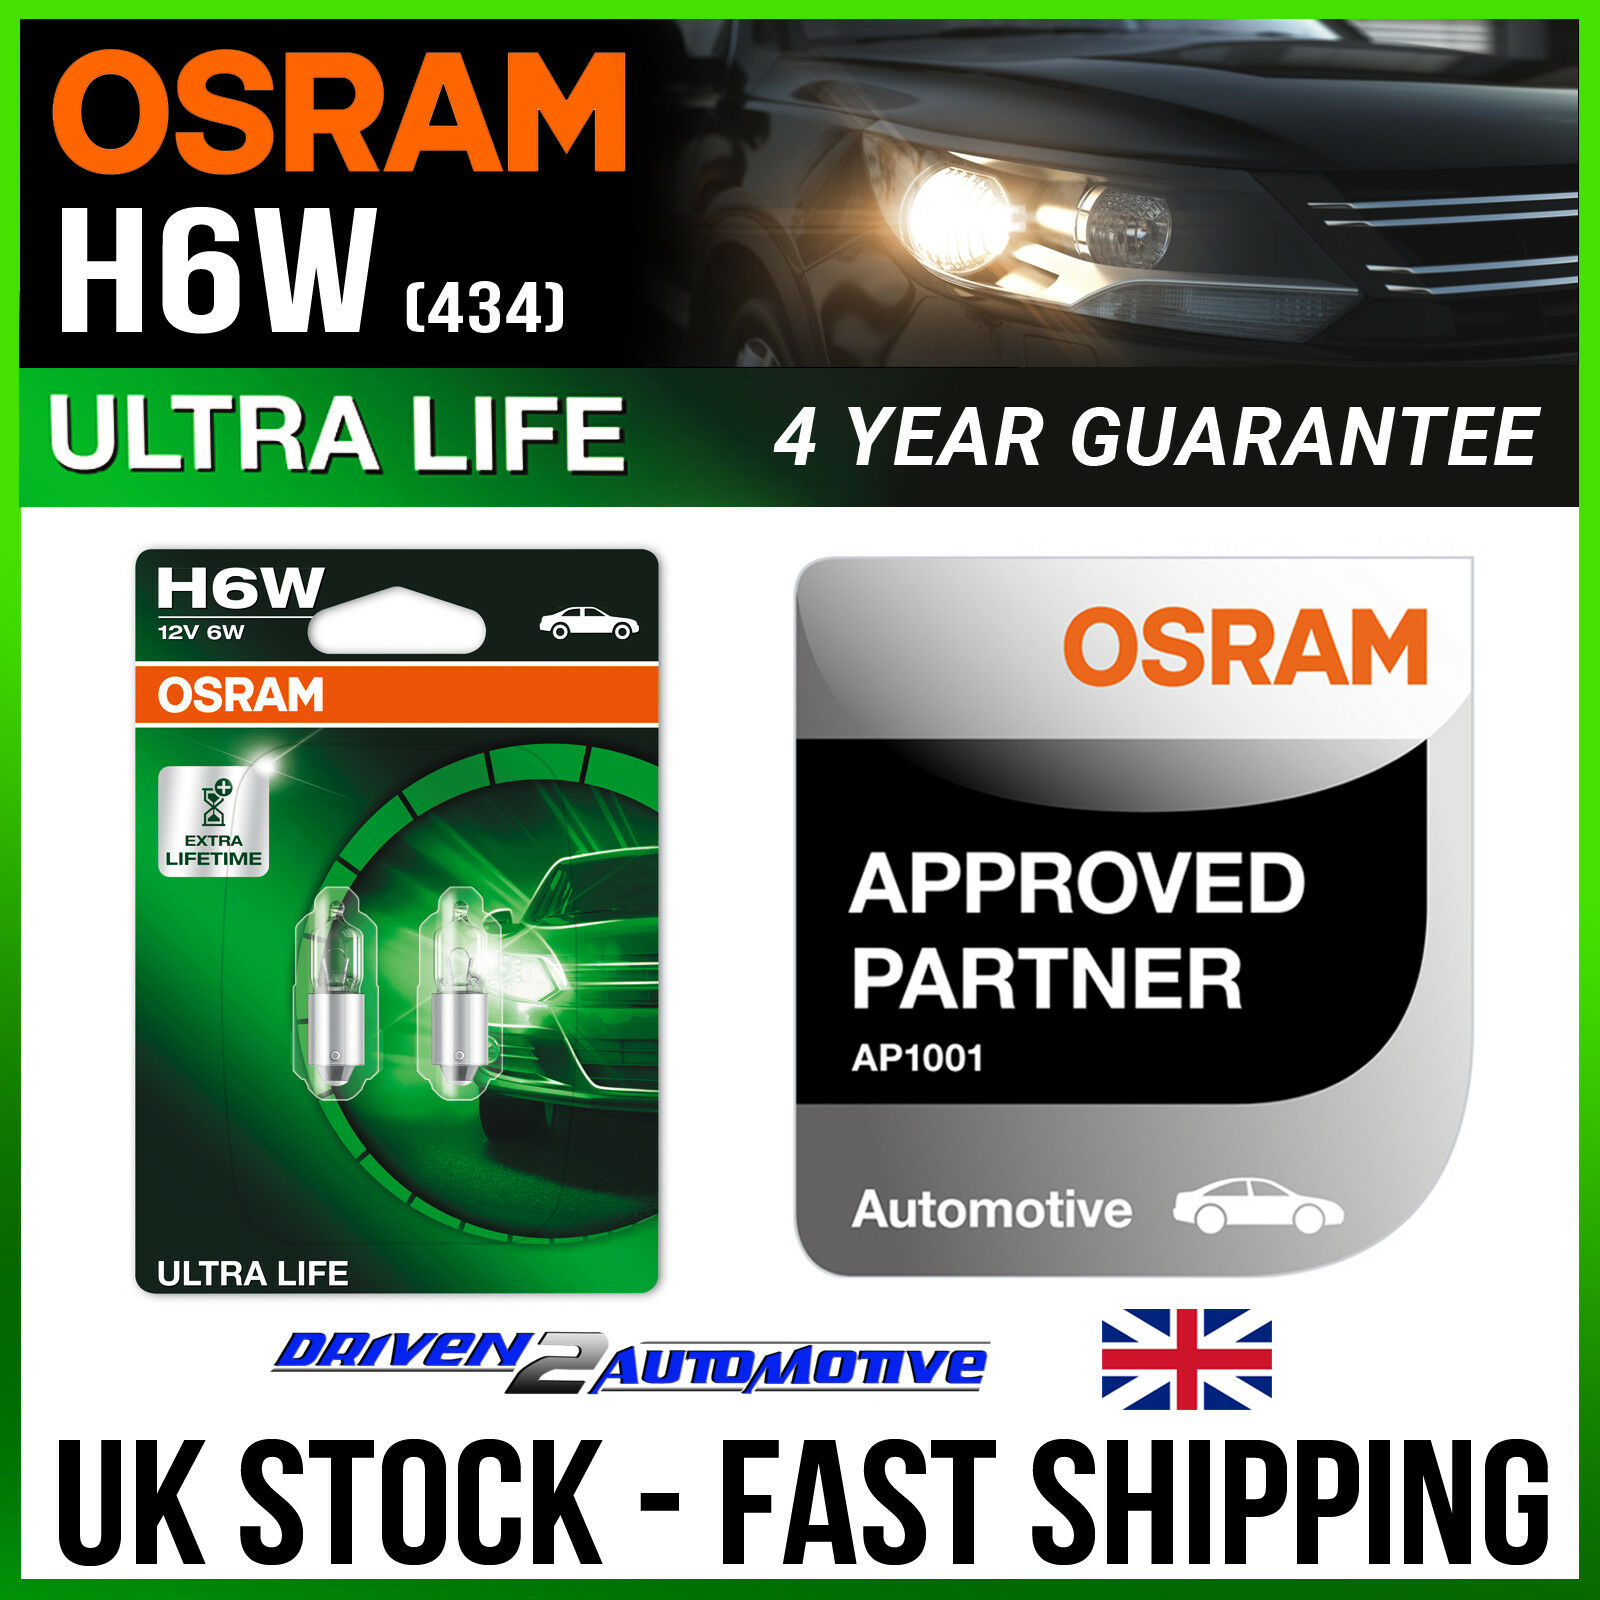 2x Mercedes 190 W201 Genuine Osram Ultra Life Number Plate Lamp Light Bulbs